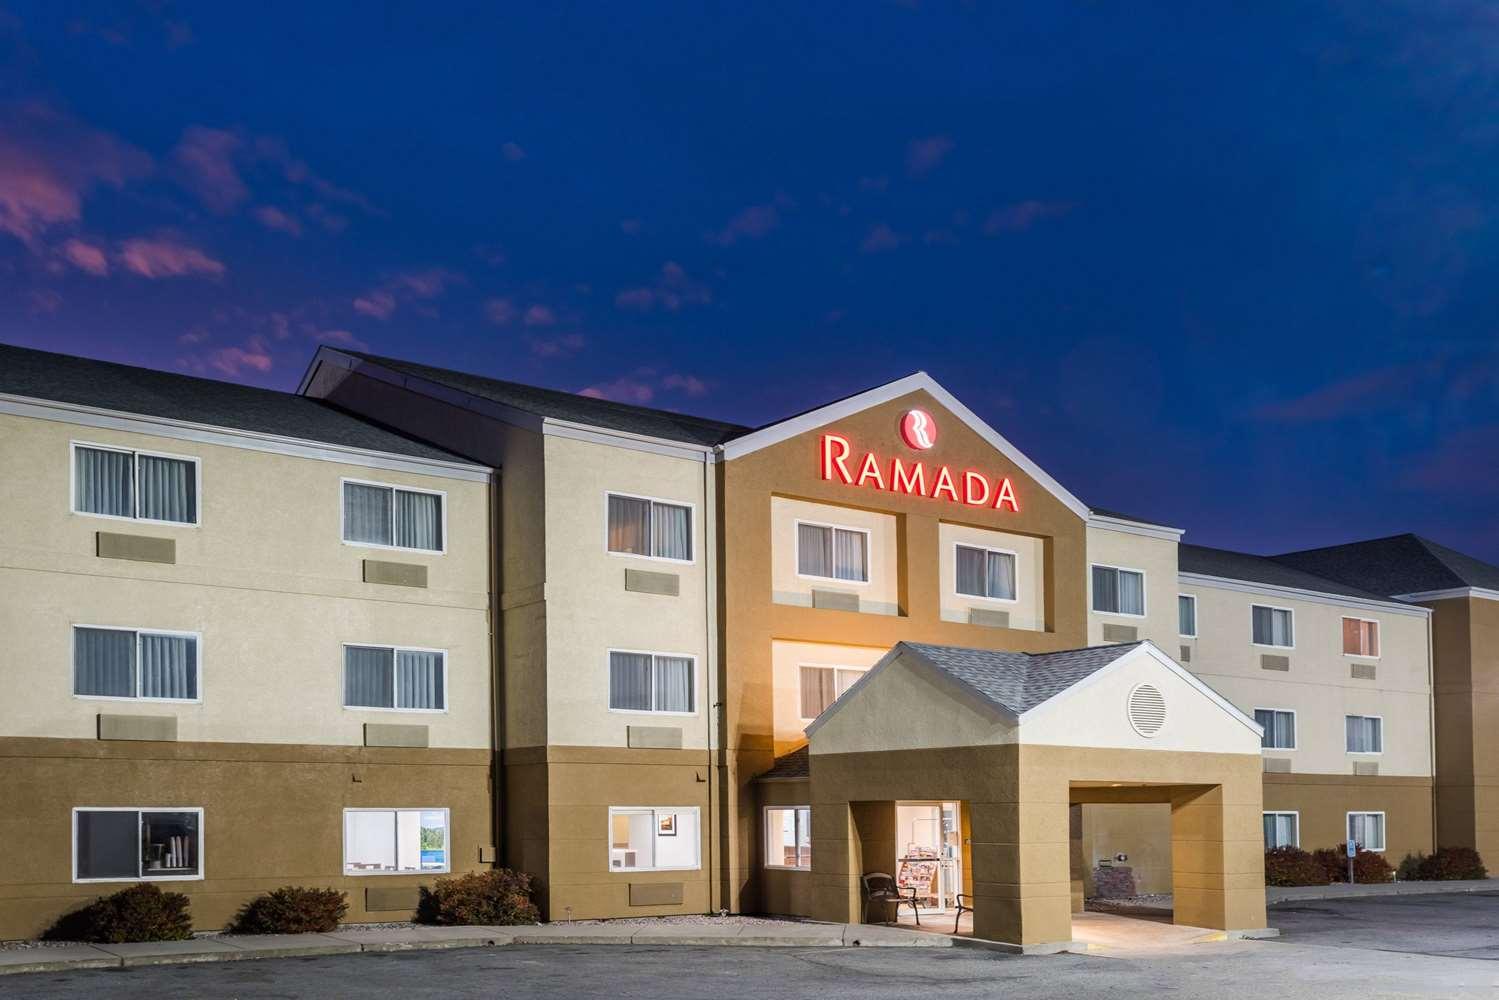 Exterior view - Ramada Hotel Coeur d'Alene